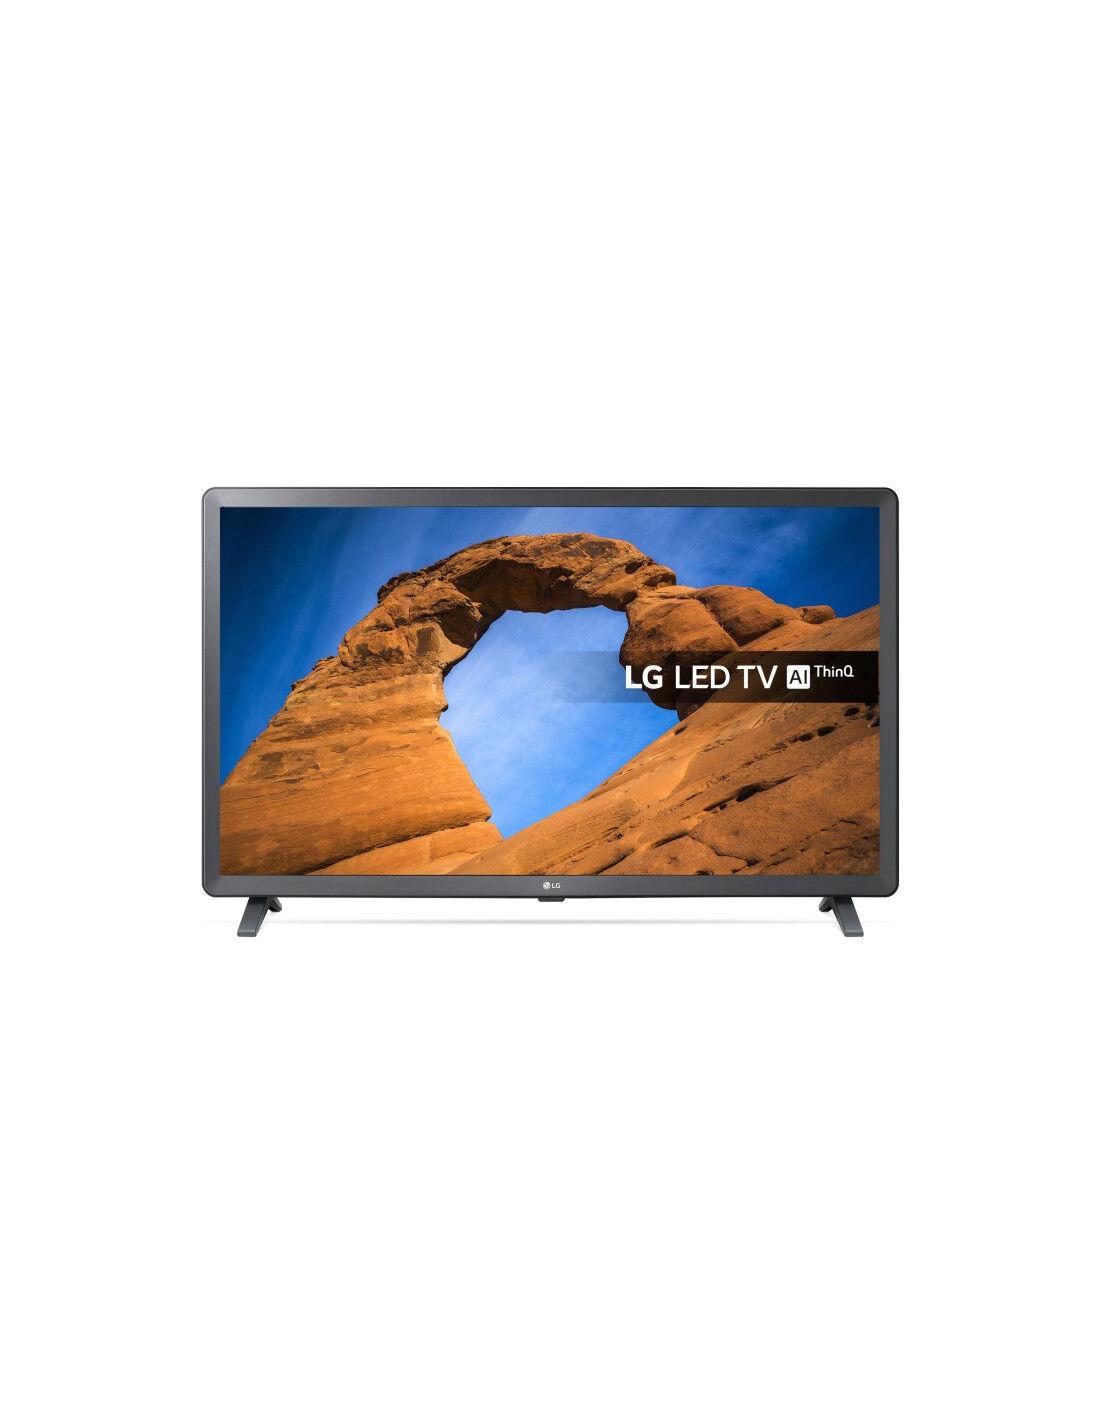 LG TV LG LG 32LK6100PLB